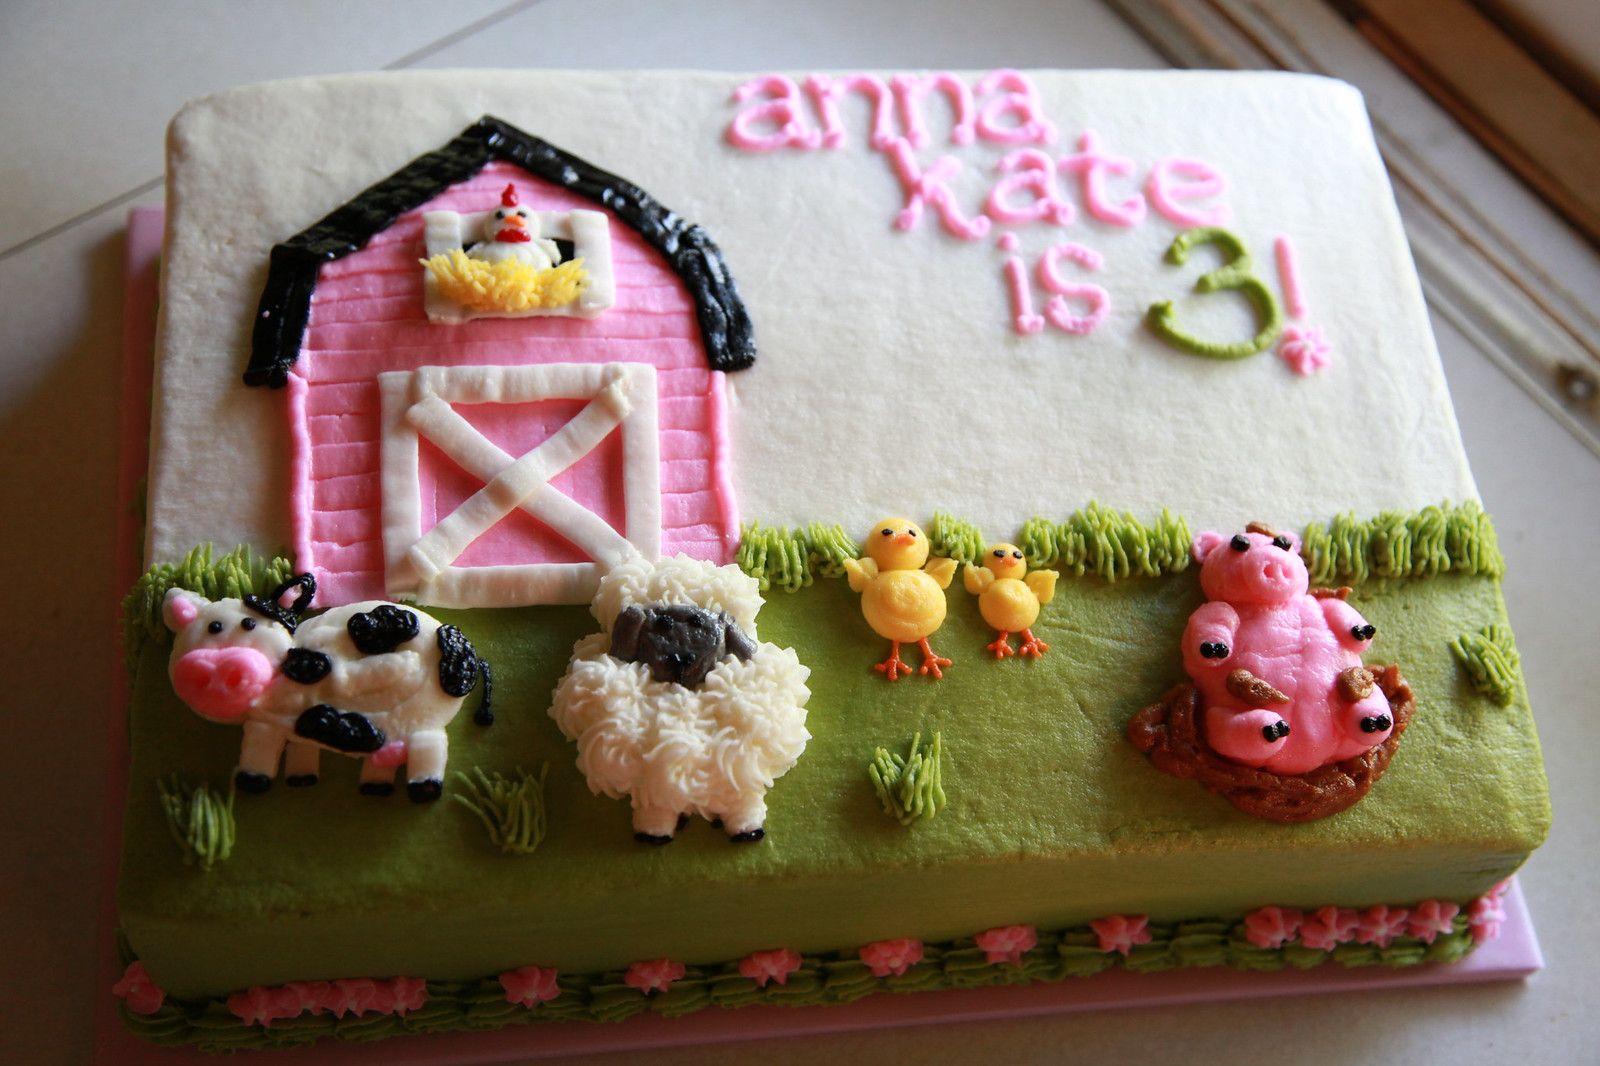 Photo of Farm birthday cake for a girl